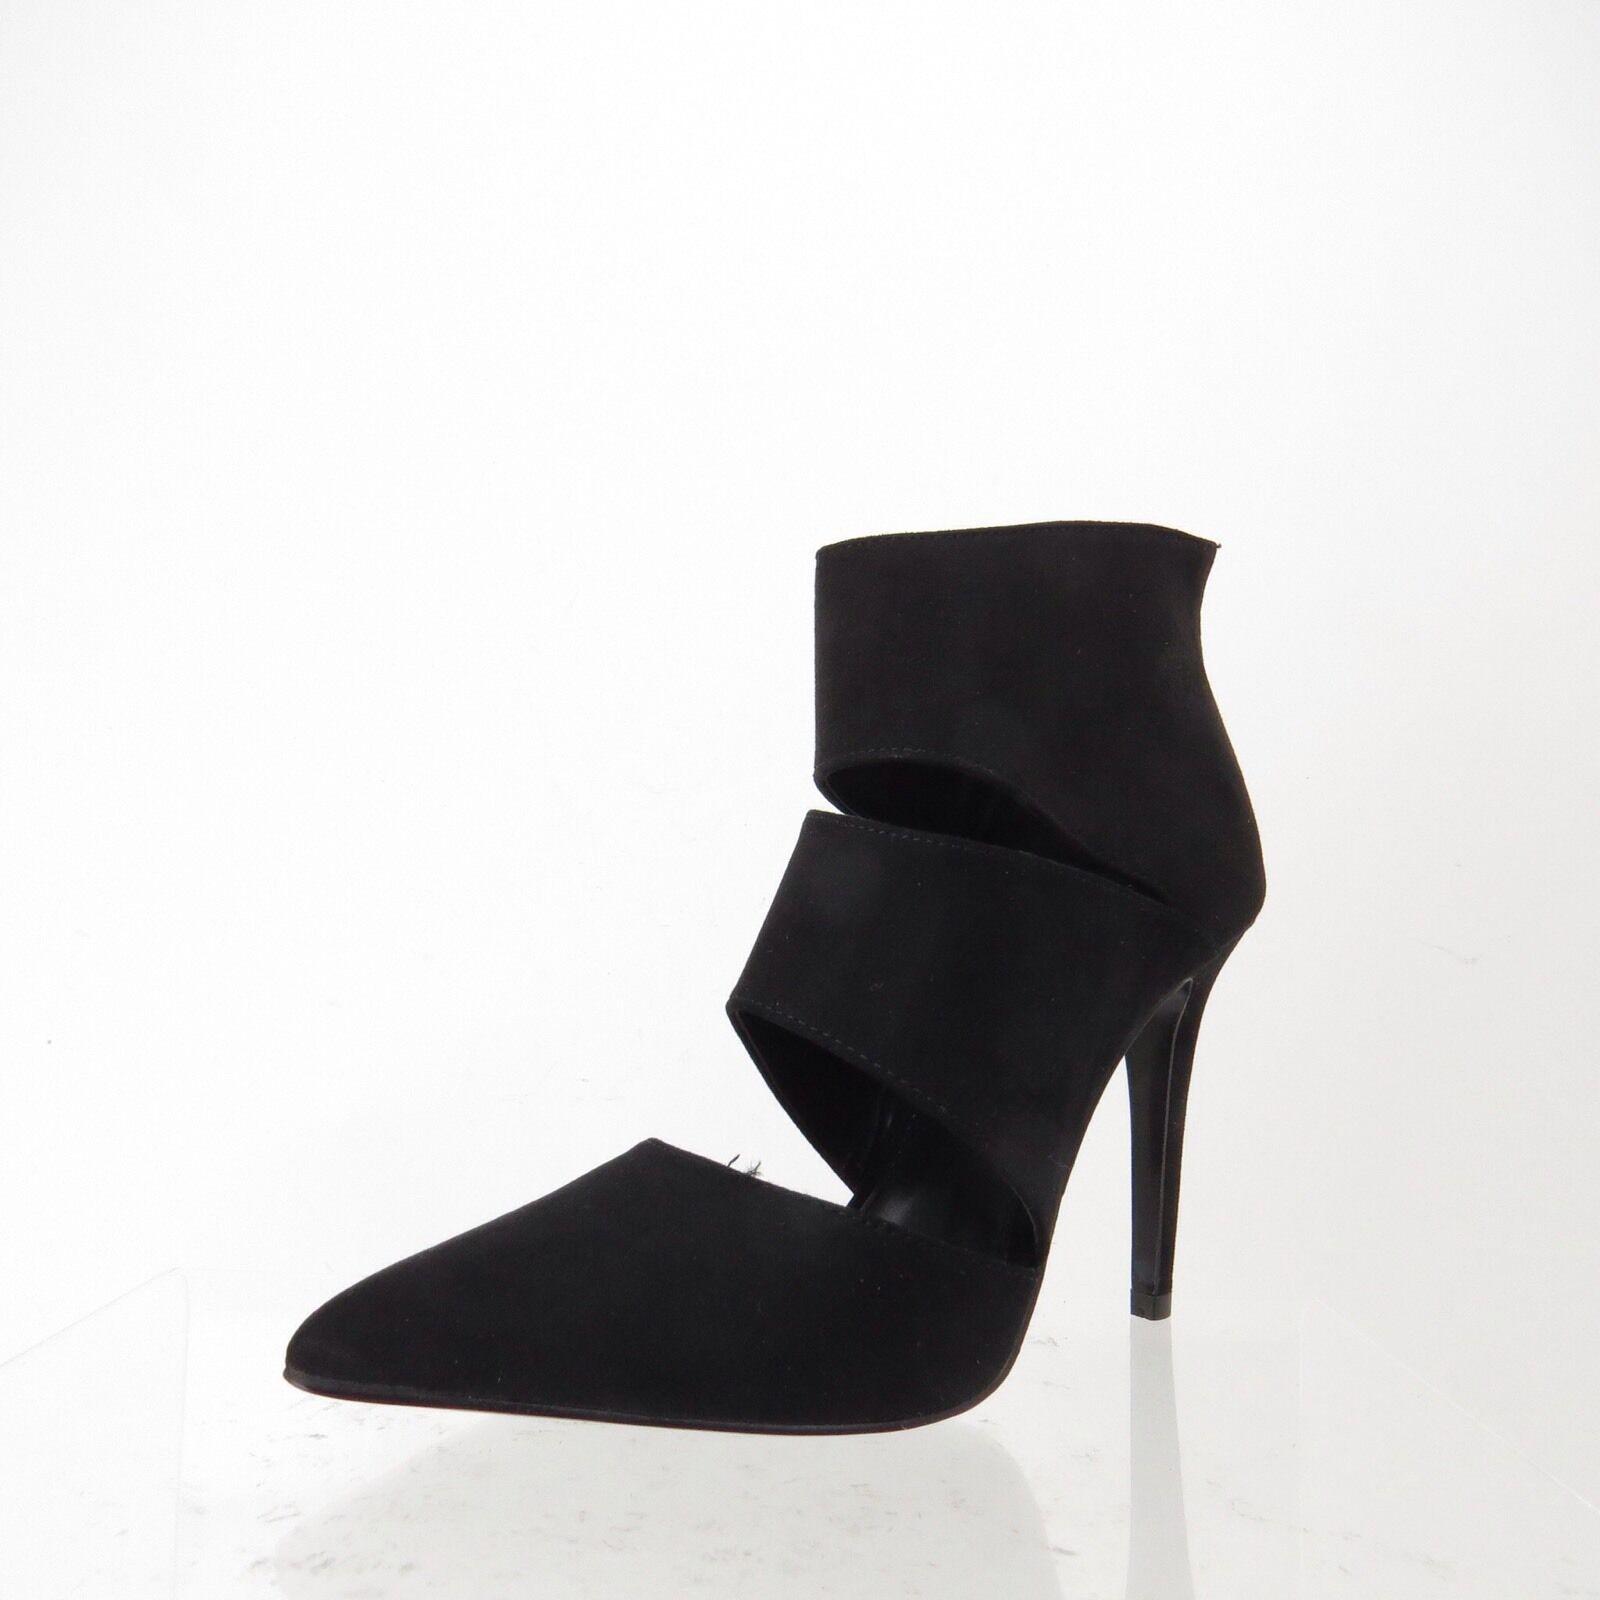 Women's Heels KG By Kurt Geiger Black Suede Platform heels, pump, Size 38 NEW